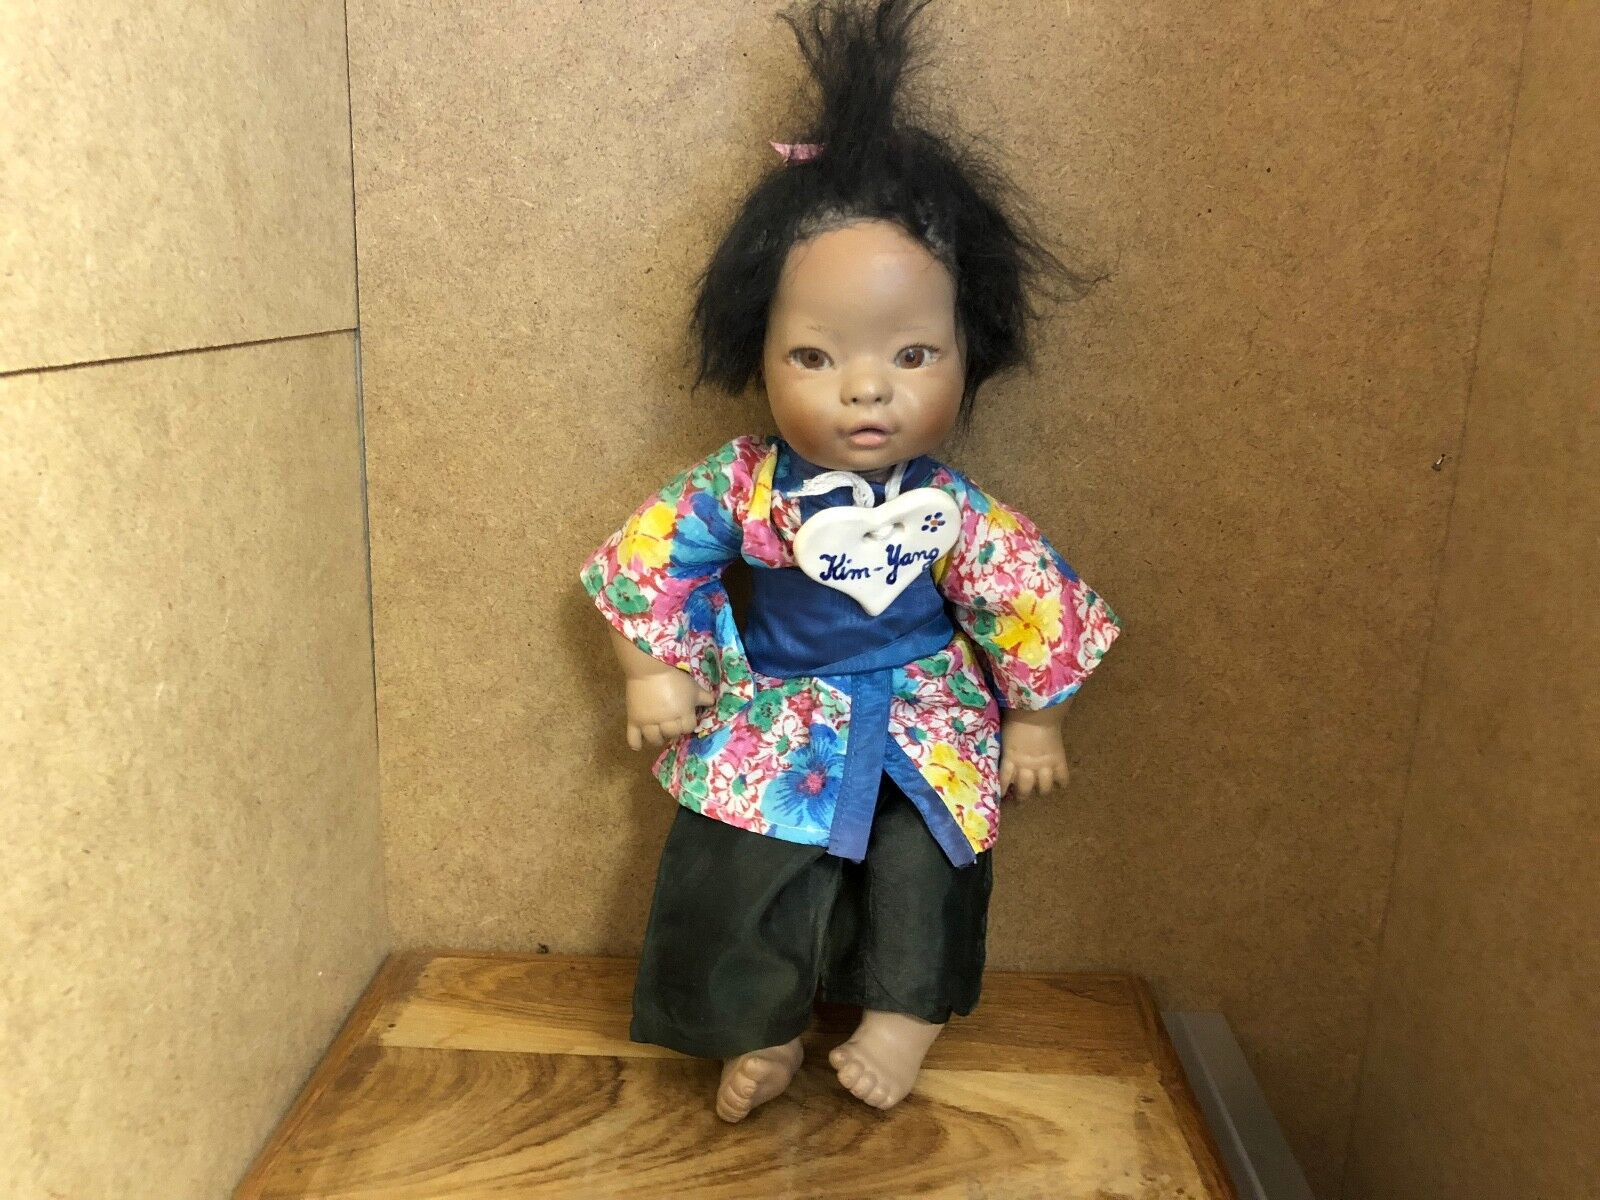 Dolls Dolls & Bears Top Zustand Künstlerpuppe Puppe Vinyl Puppe 57 Cm